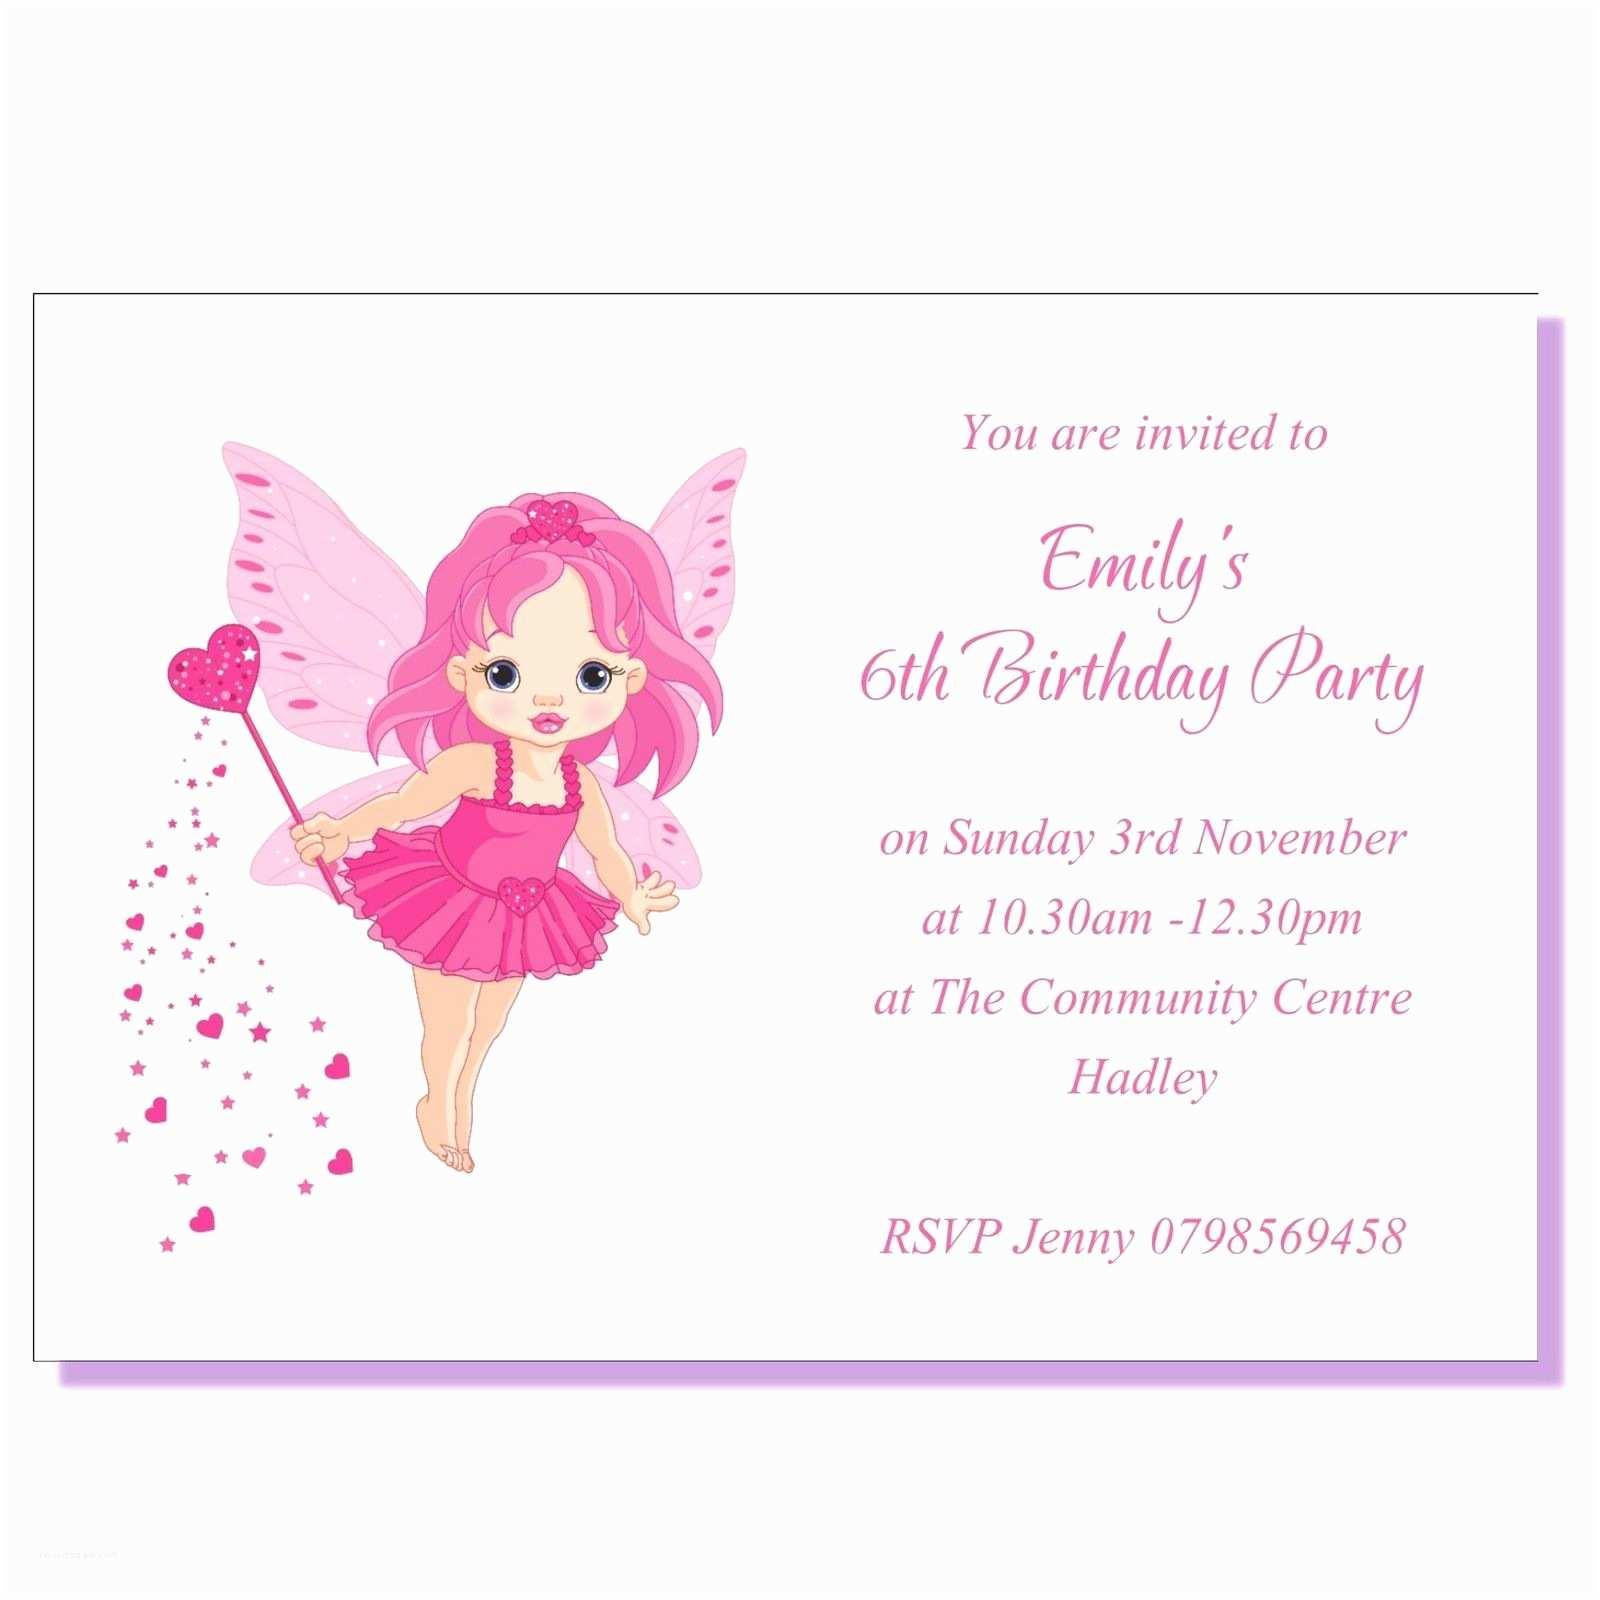 Kids Birthday Invitations Childrens Party Invites Toddler